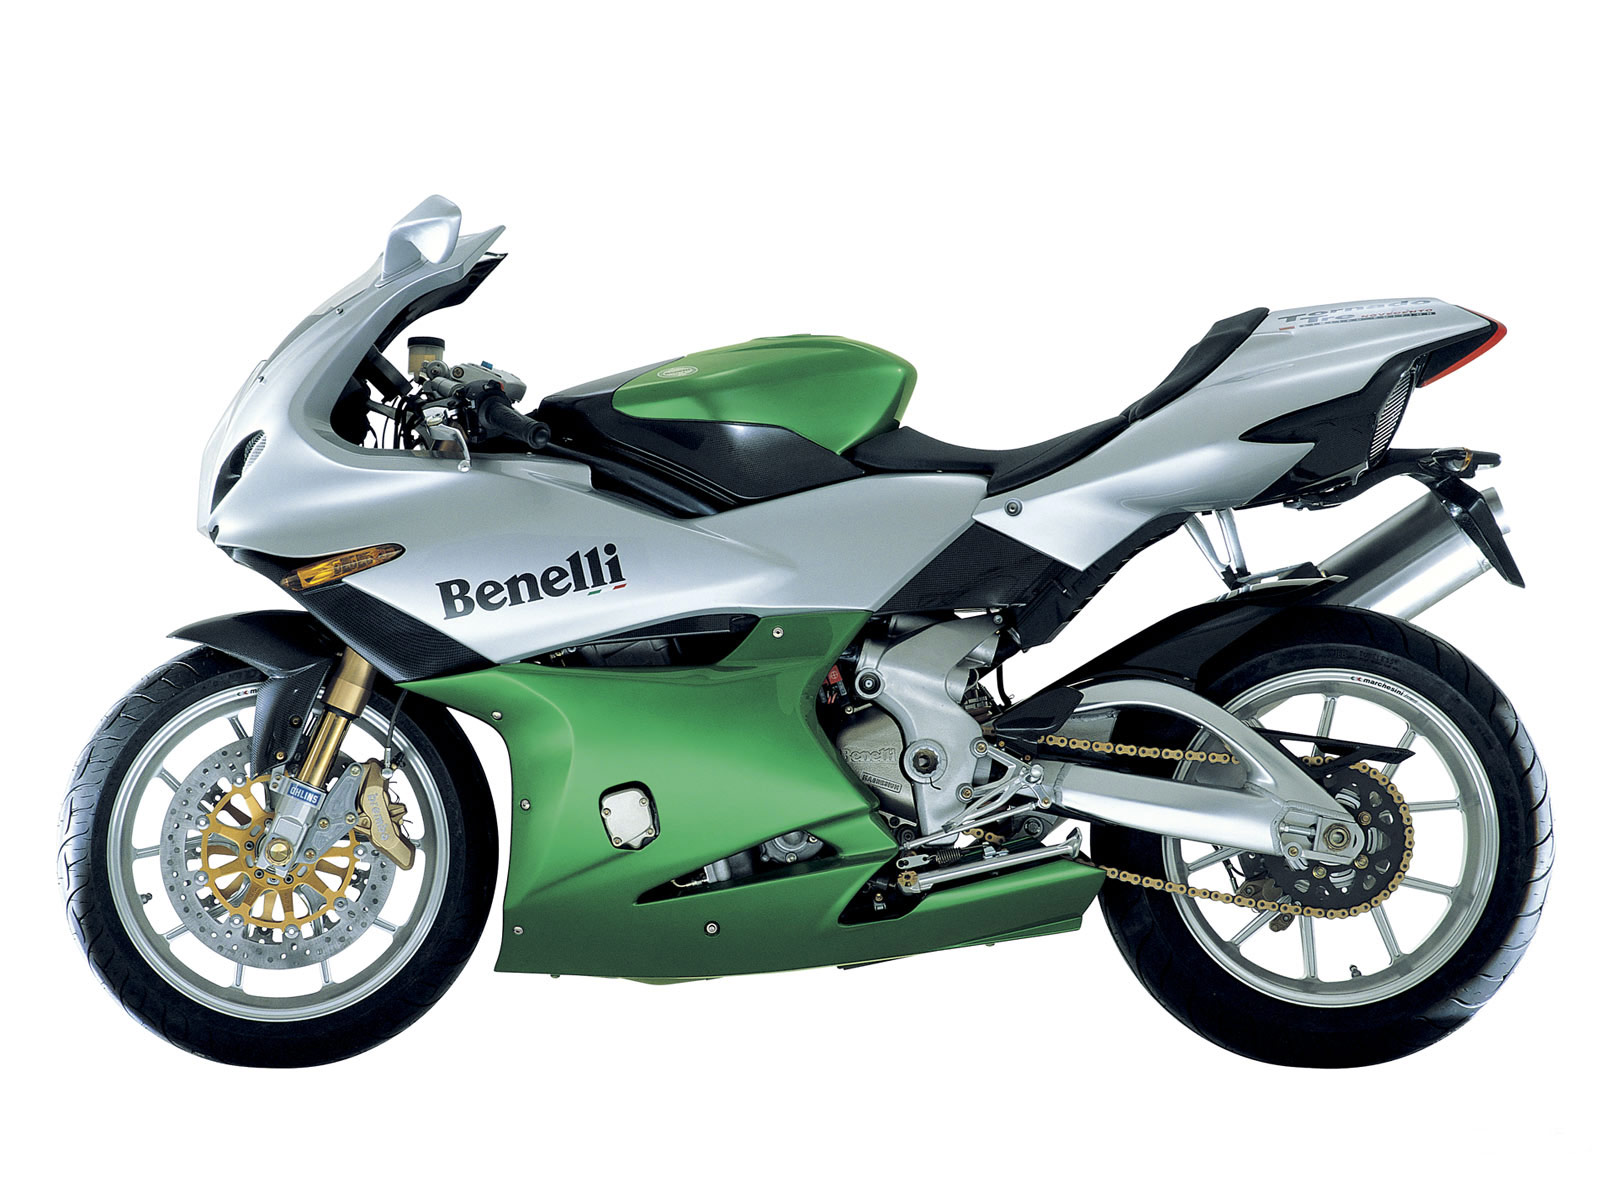 http://4.bp.blogspot.com/-PkcbukV4dhw/Tm8chYfeAcI/AAAAAAAAA68/CrRLwbdDpcs/s1600/2006_Benelli_tornado_TRE_LE_motorcycle-desktop-wallpaper_5.jpg